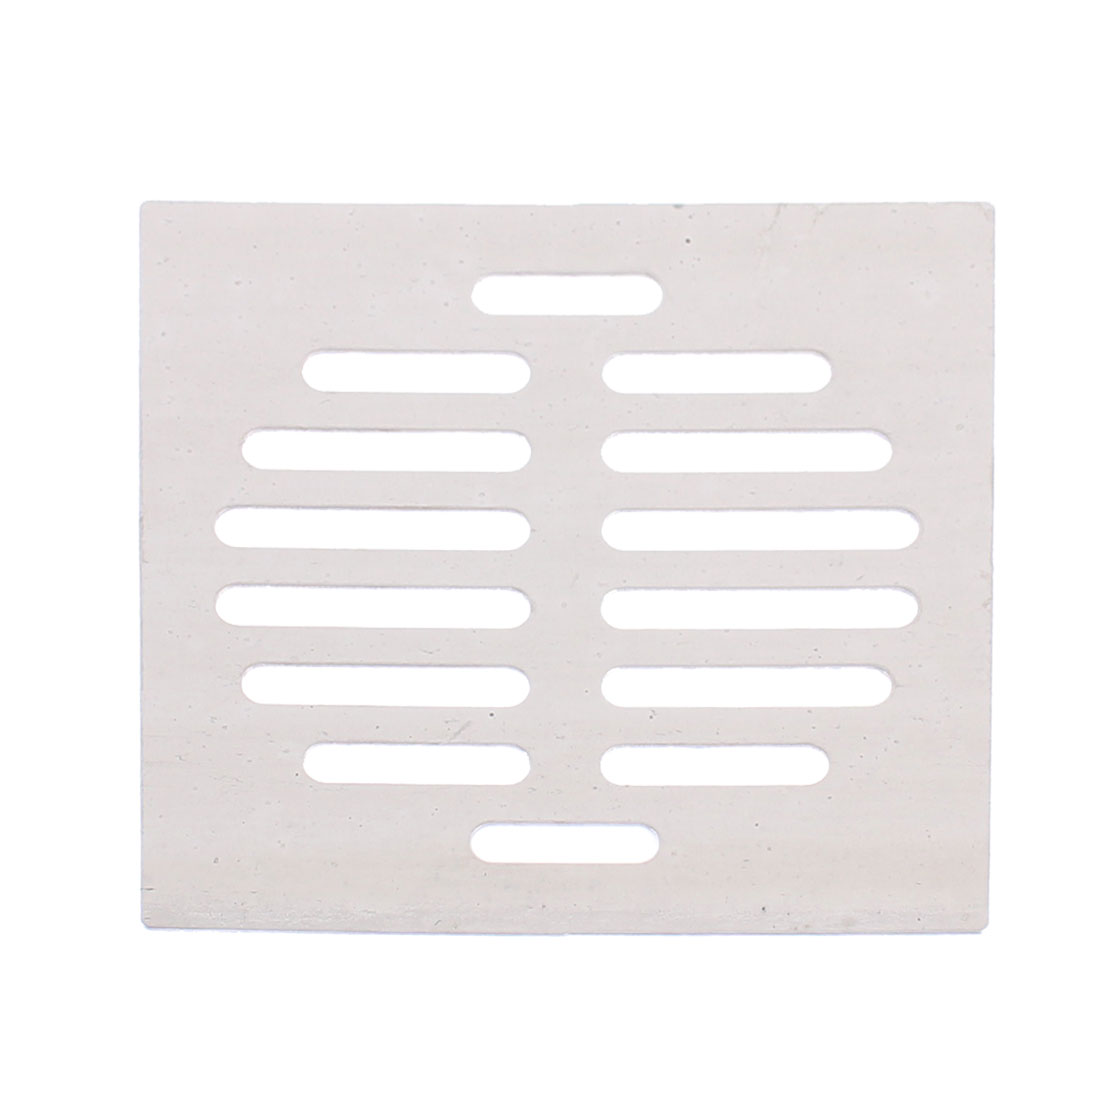 "Stainless Steel Kitchen Bathroom Square Floor Drain Cover 4.4"" 11.3cm"